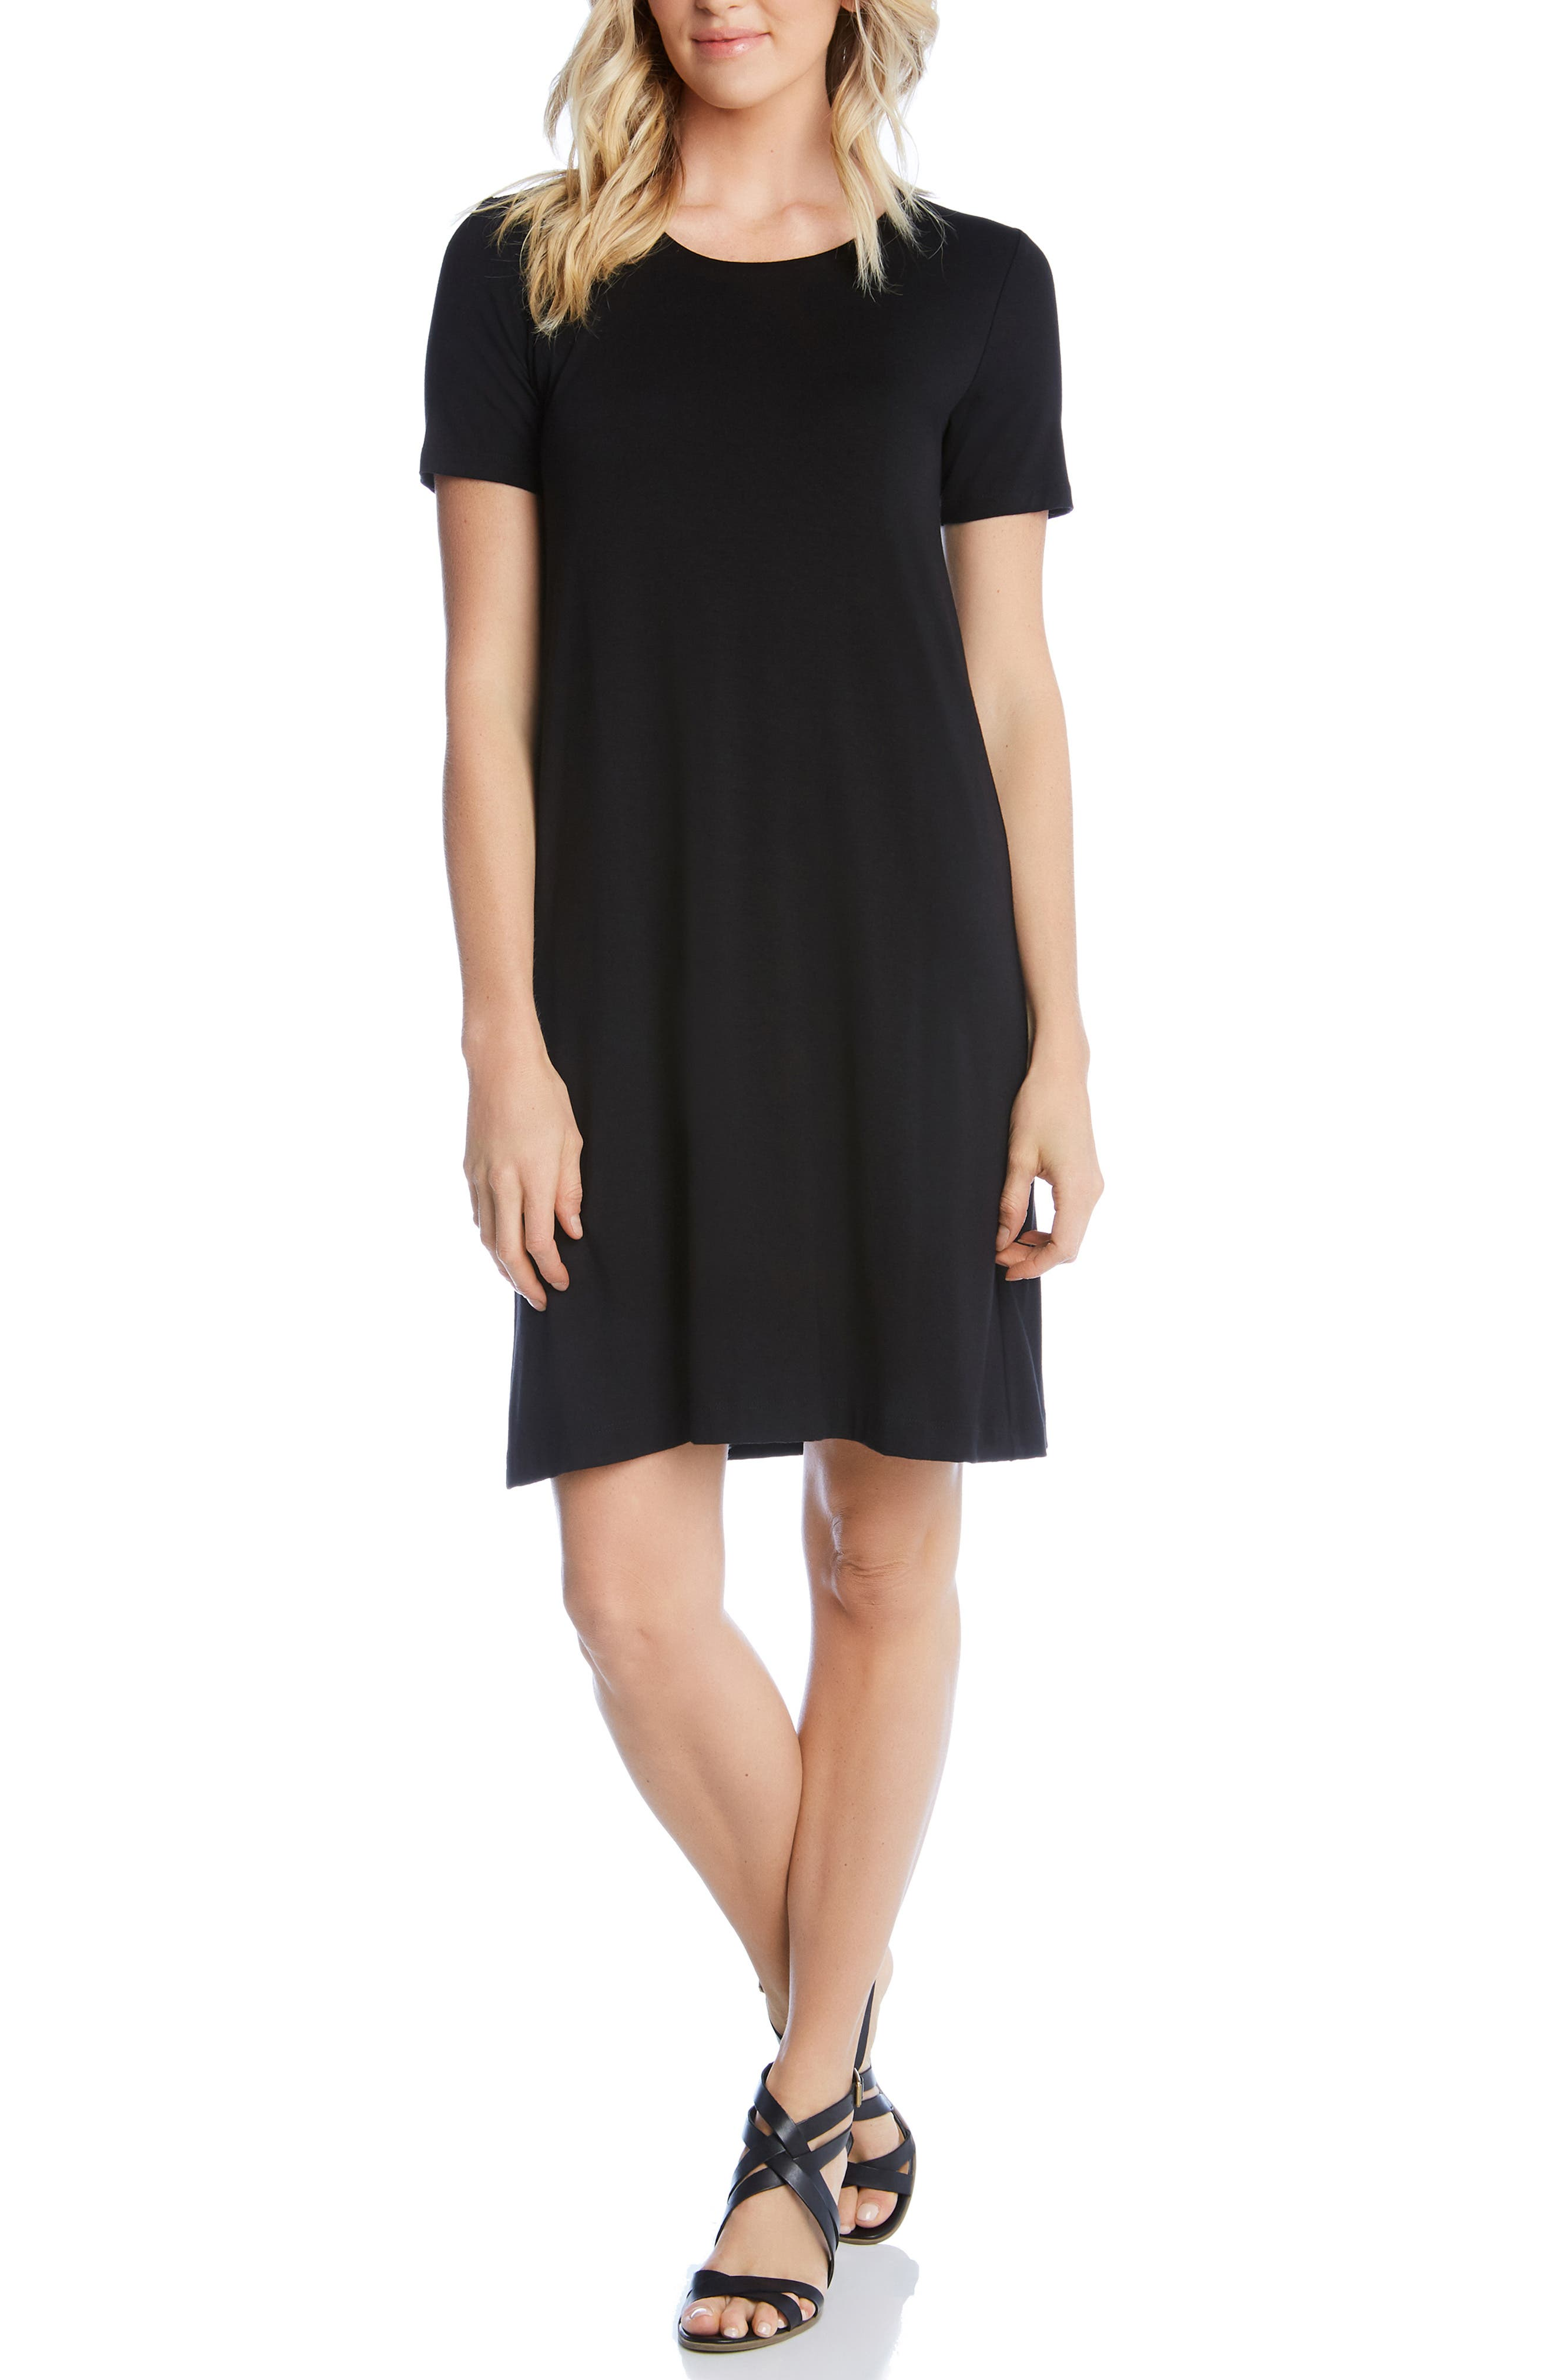 KAREN KANE, Abby T-Shirt Dress, Main thumbnail 1, color, BLACK